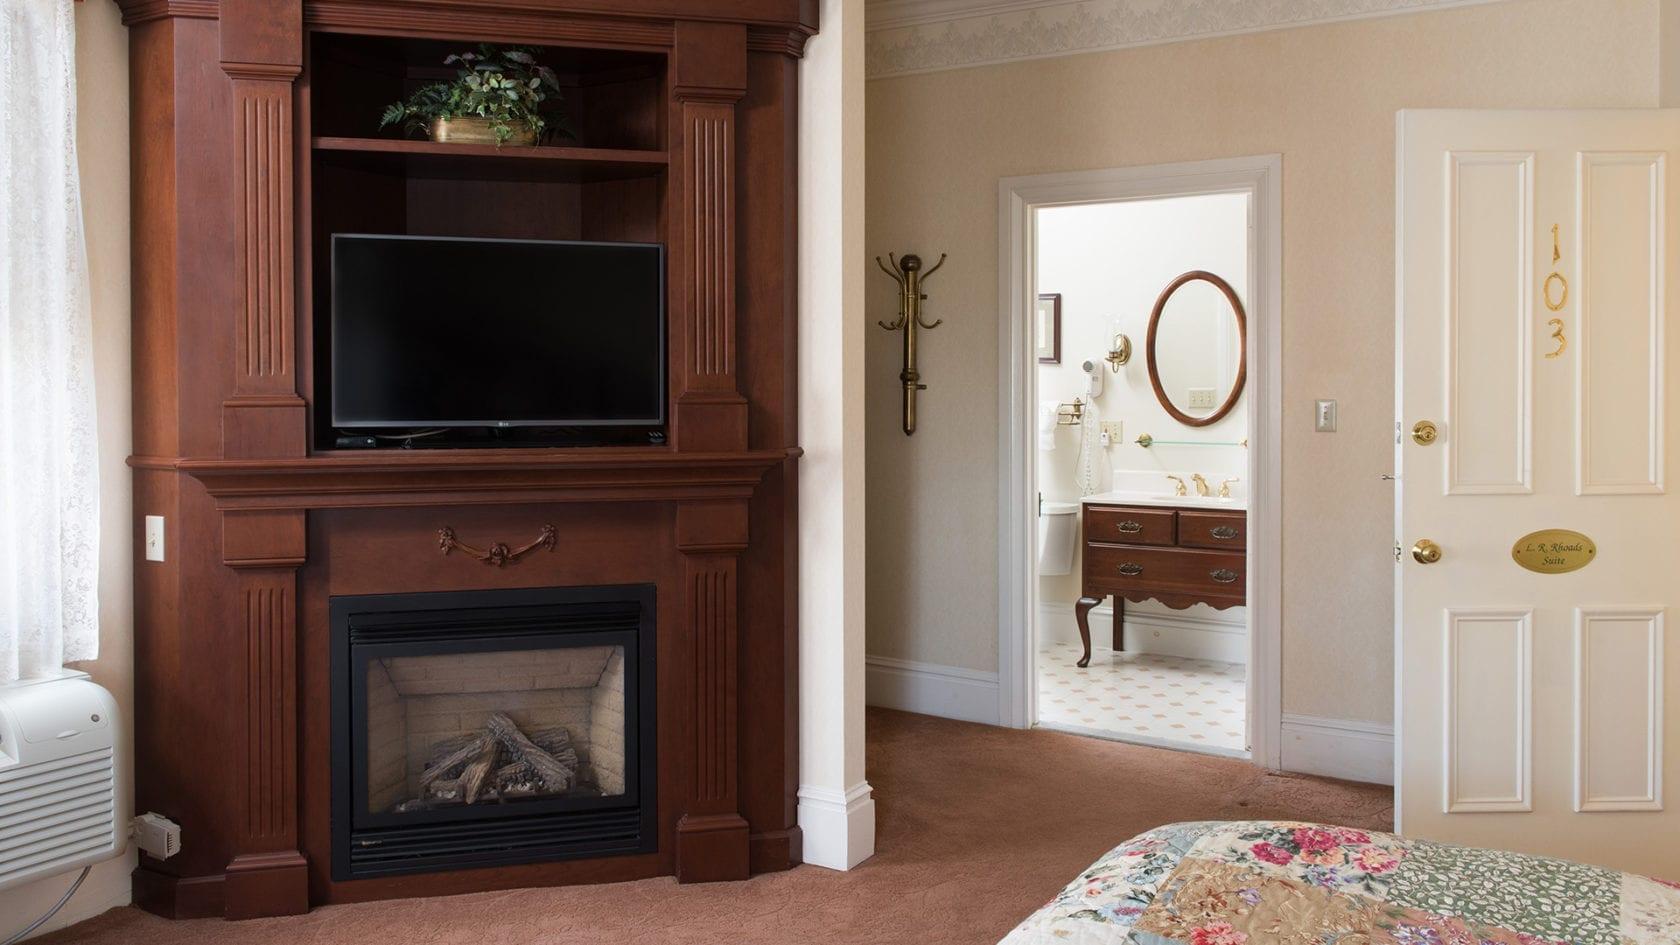 Rhoads Suite TV Cabinet